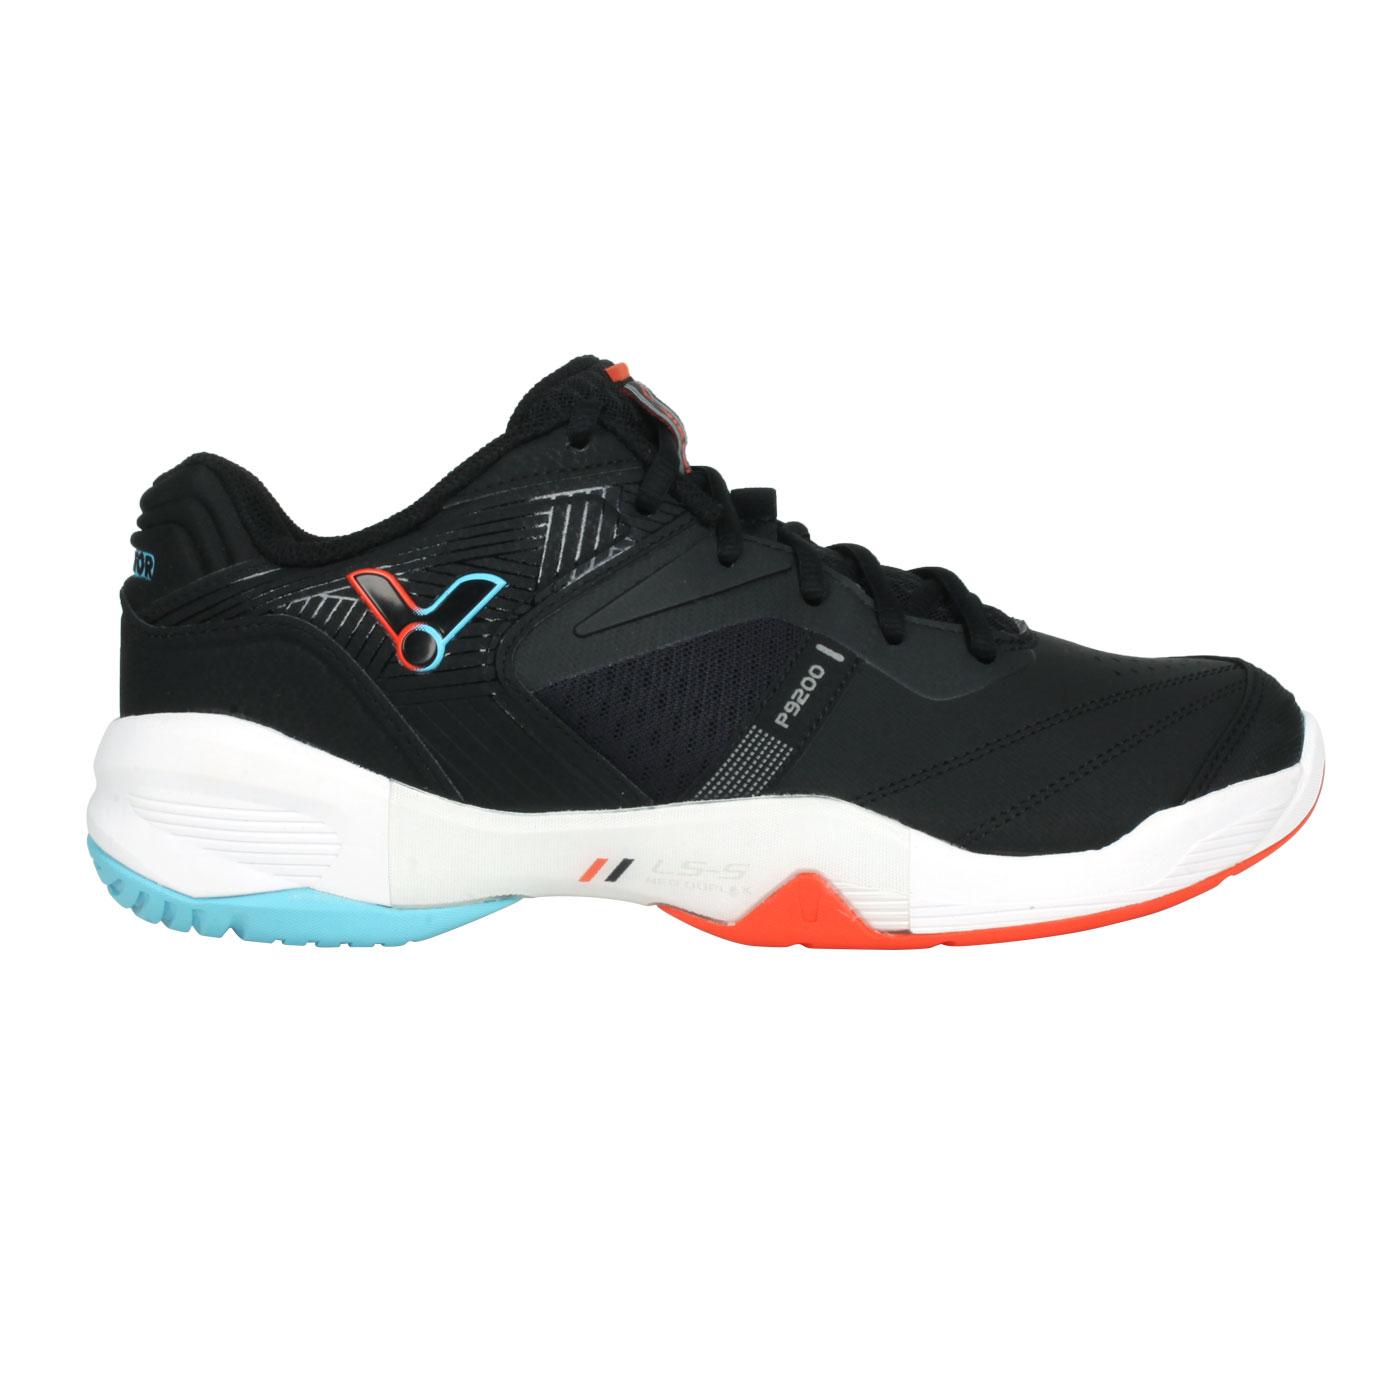 VICTOR 羽球鞋 P9200CC-CA - 黑橘藍